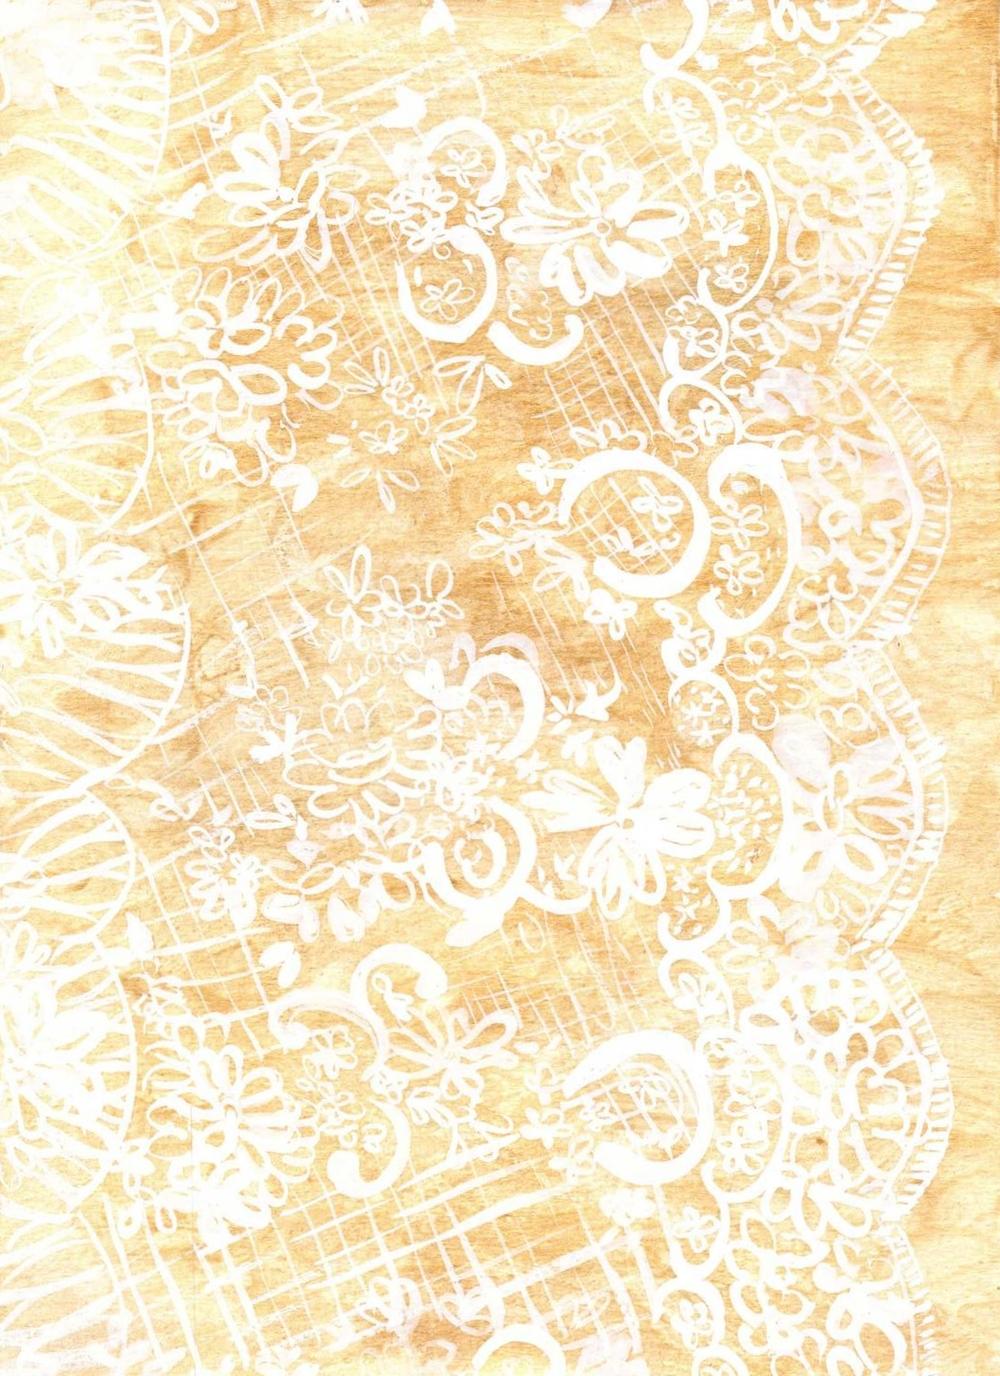 2015_02_27_10_11_14 Lace.jpg